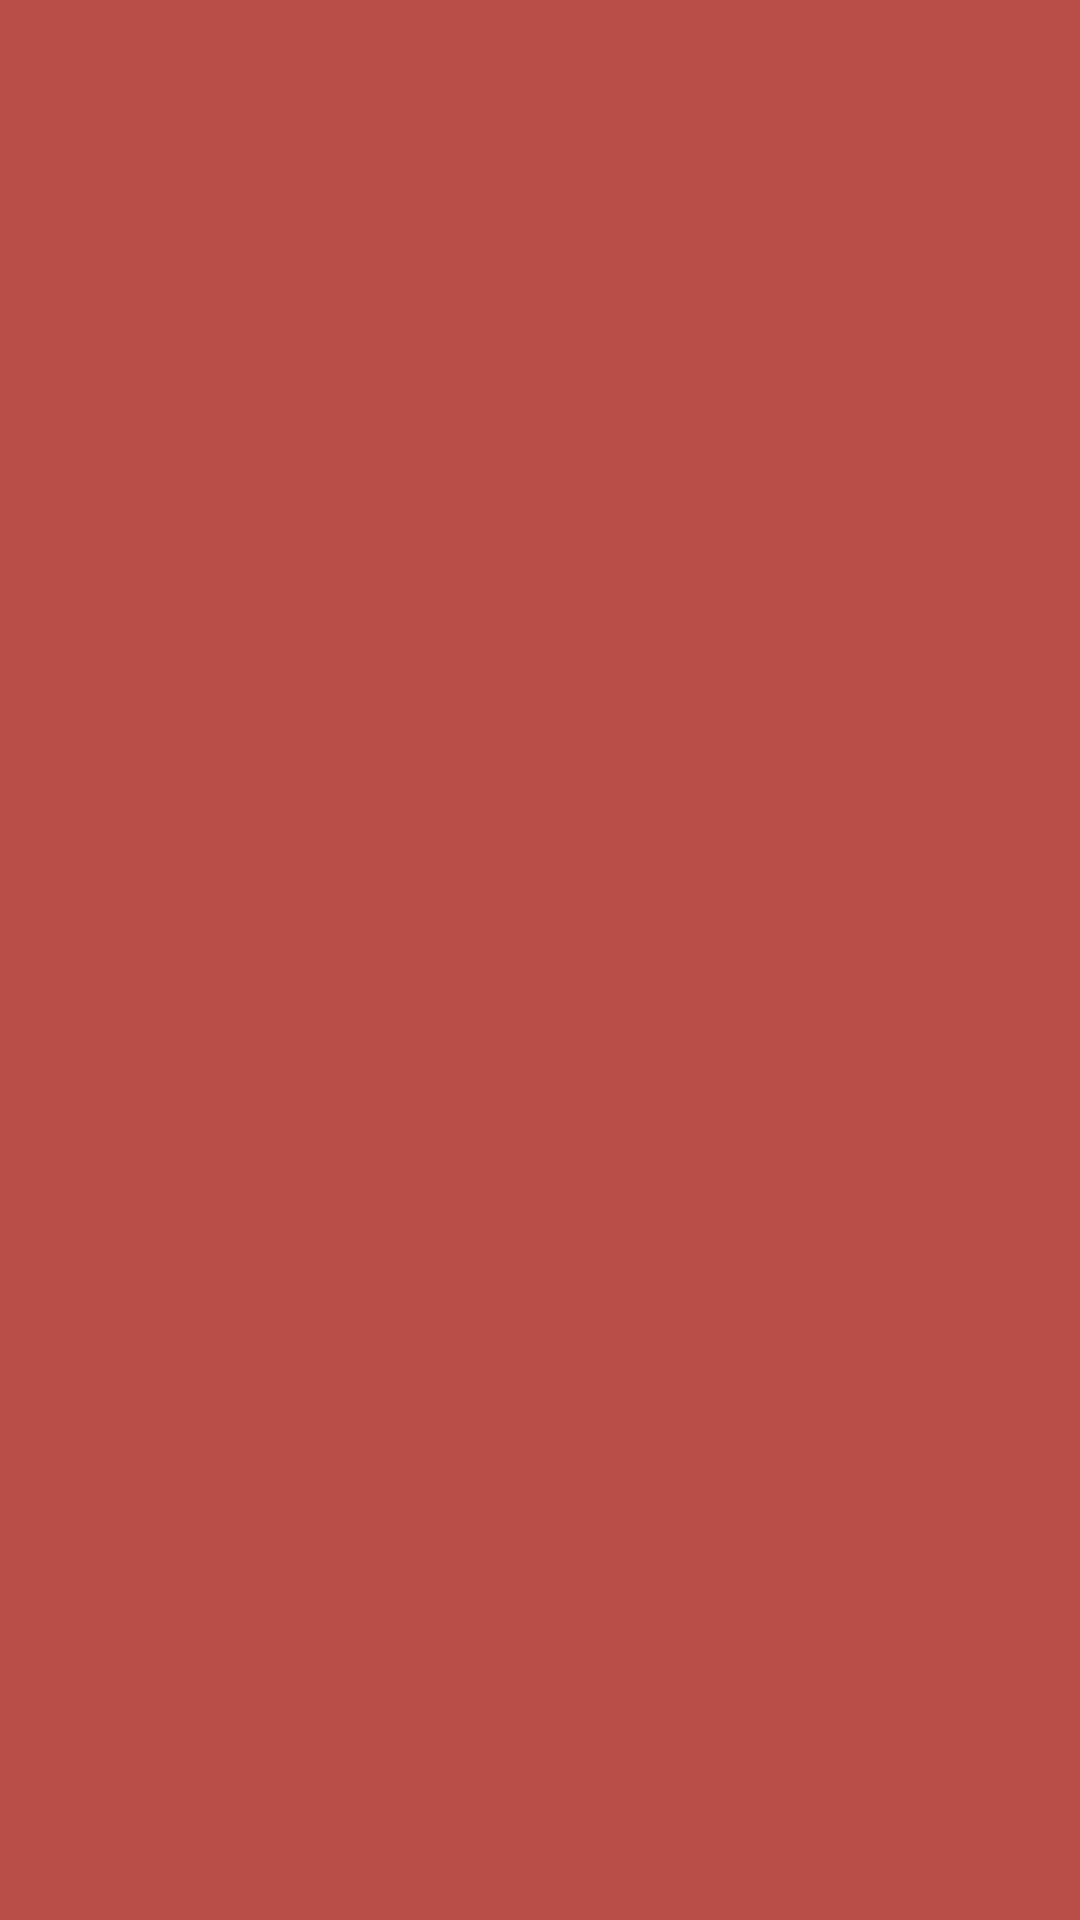 1080x1920 Deep Chestnut Solid Color Background